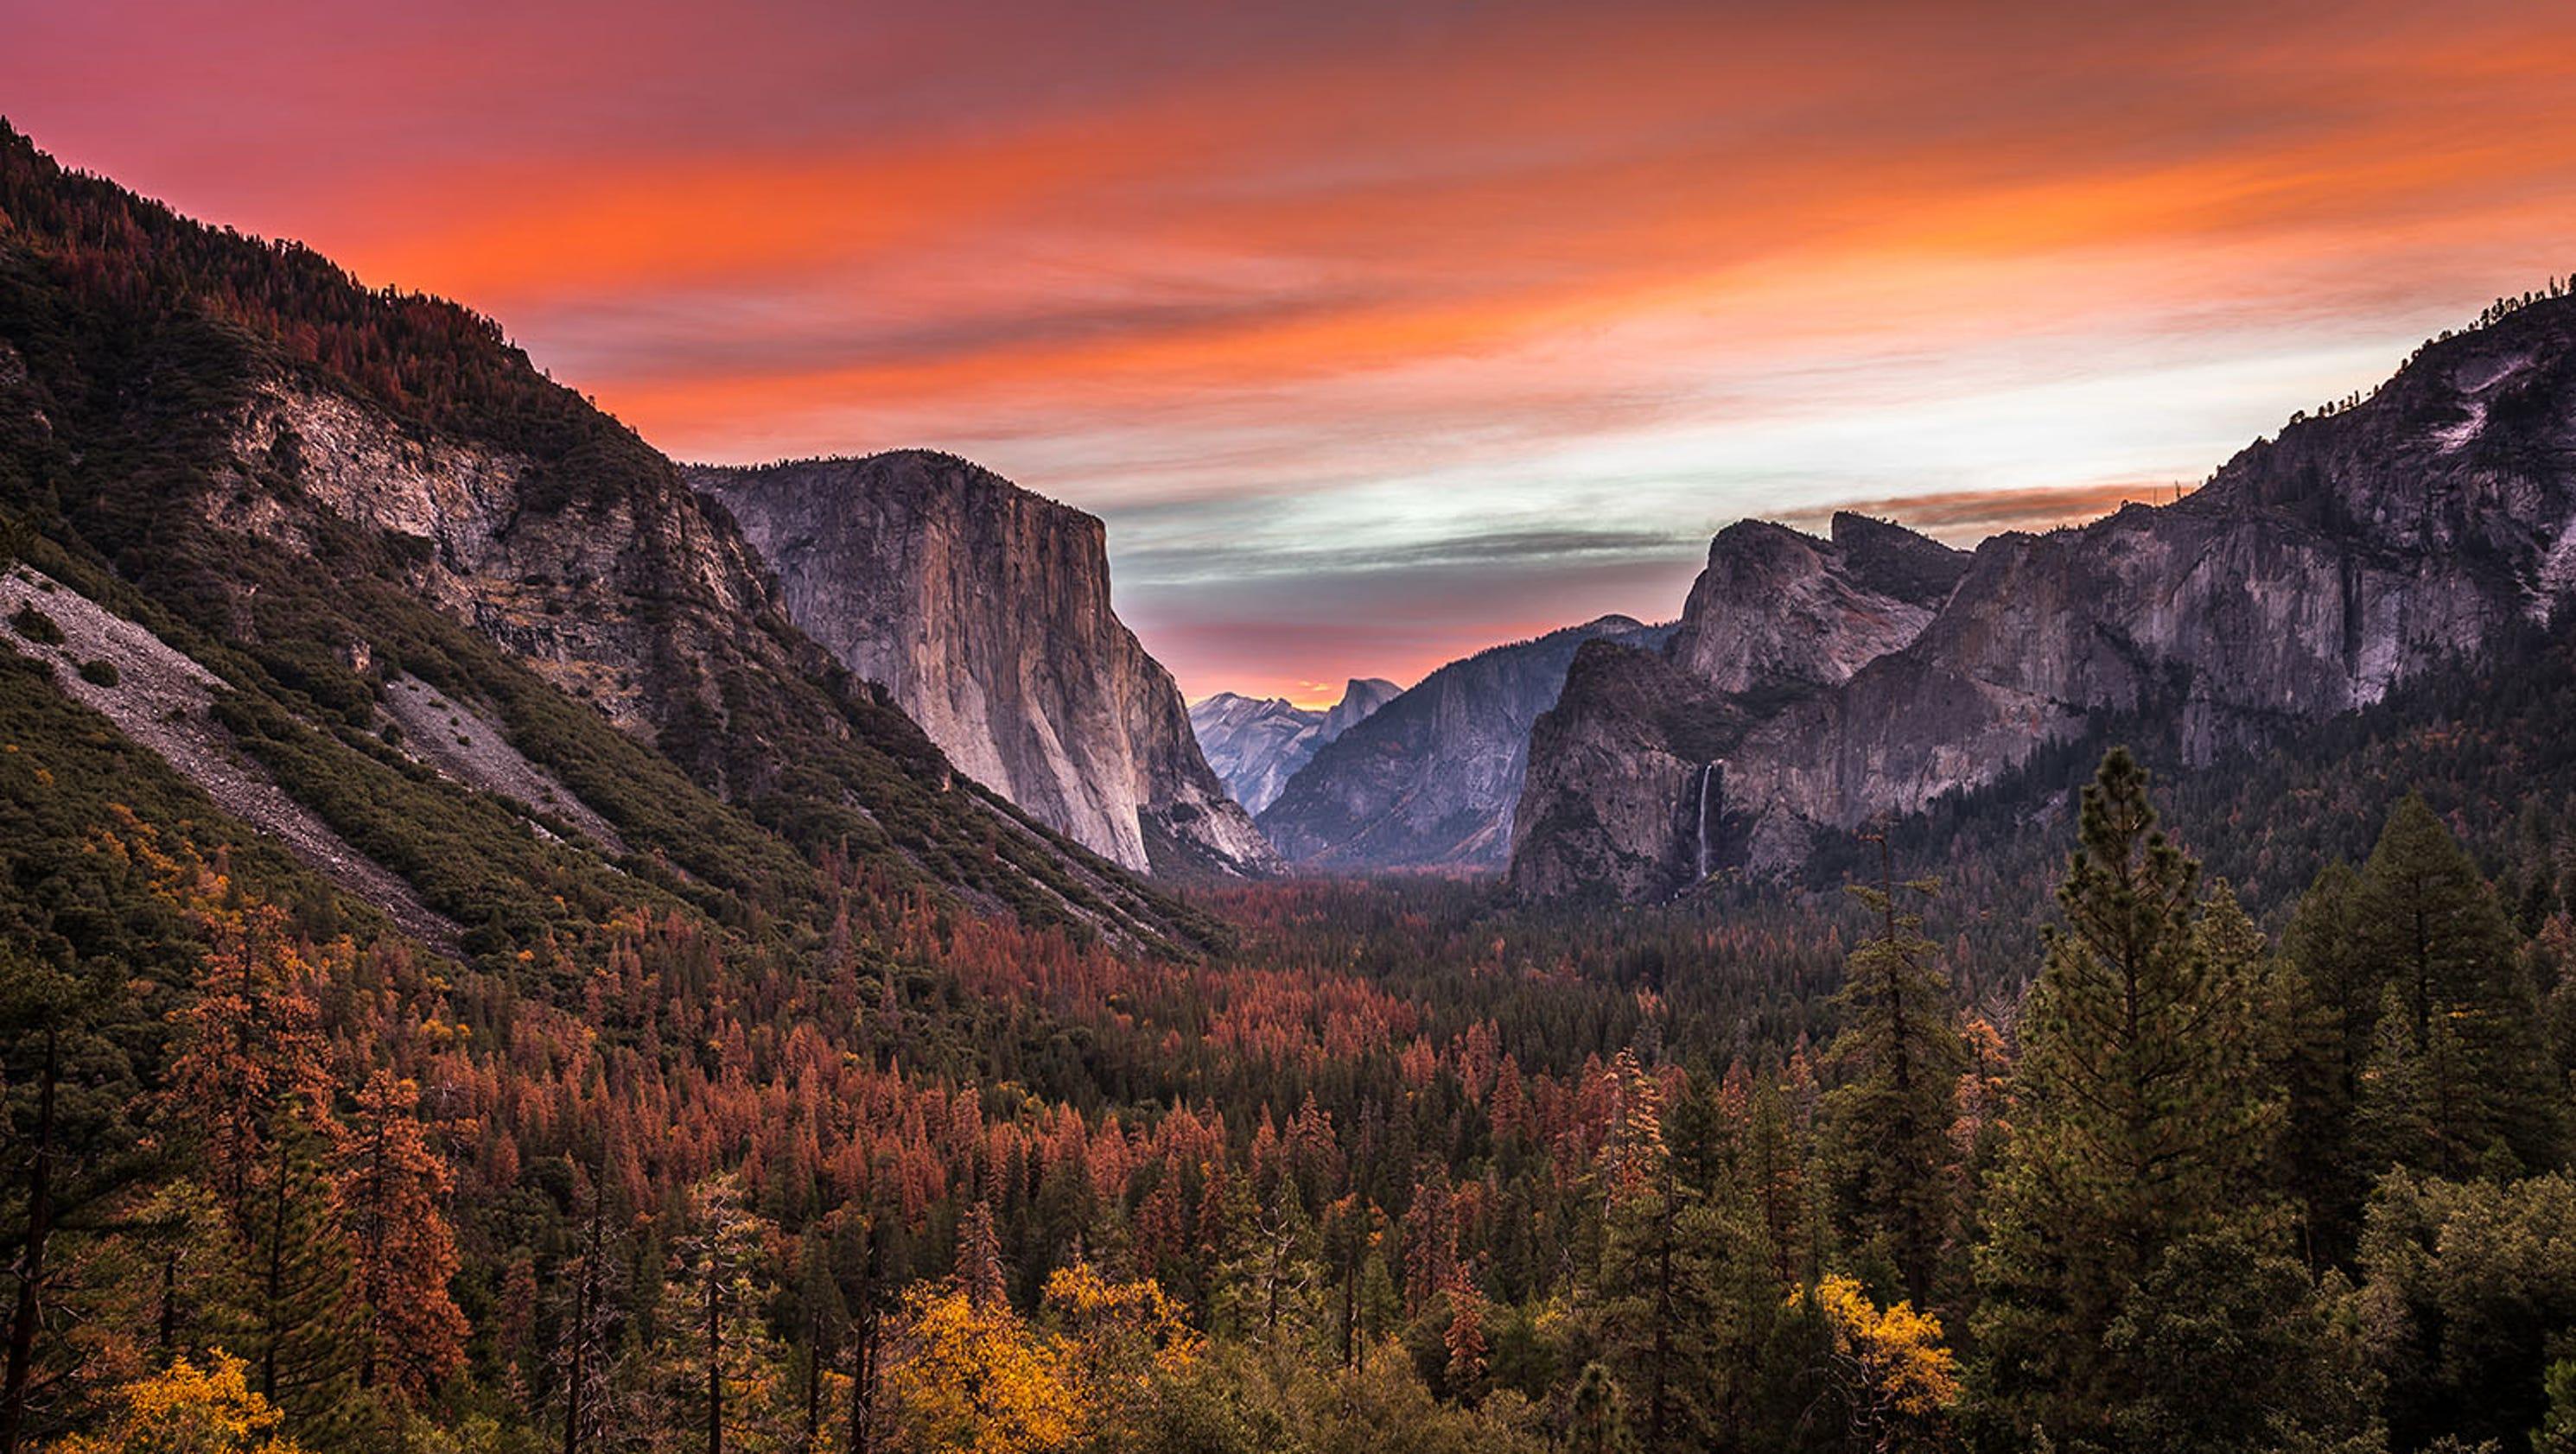 Yosemite Travel Guide Free